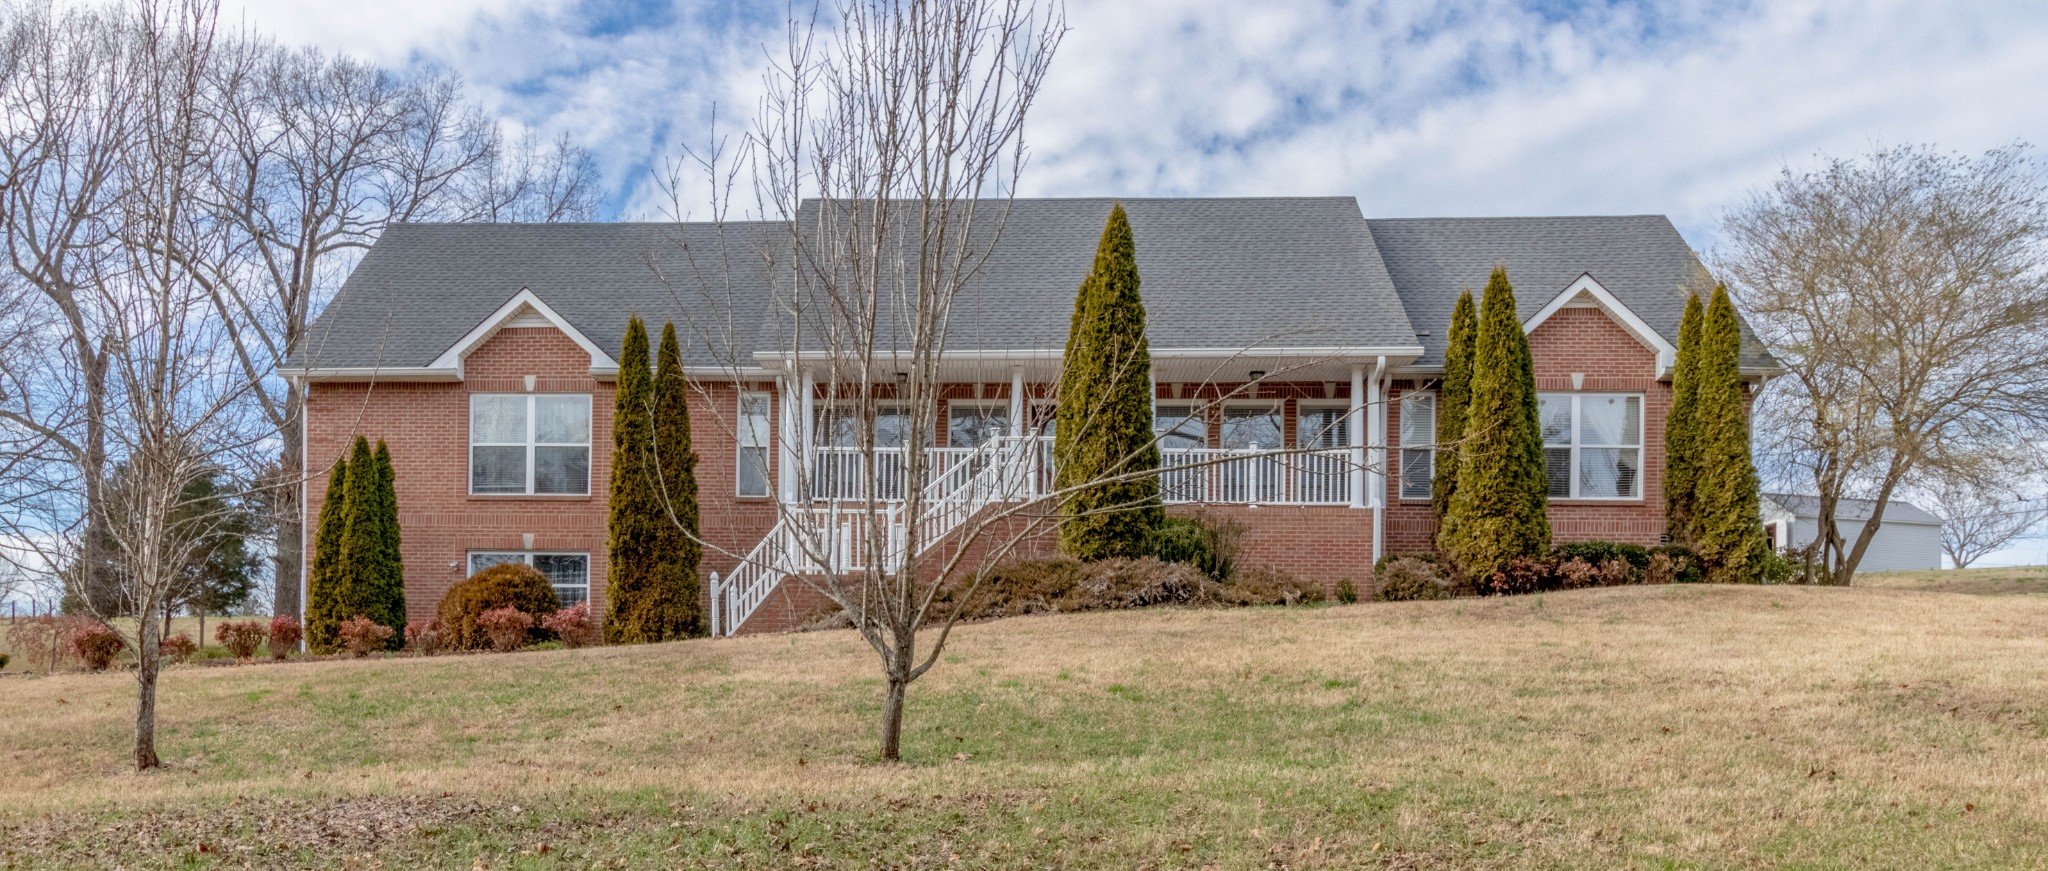 1981 Highway 76, Adams, TN 37010 - Adams, TN real estate listing